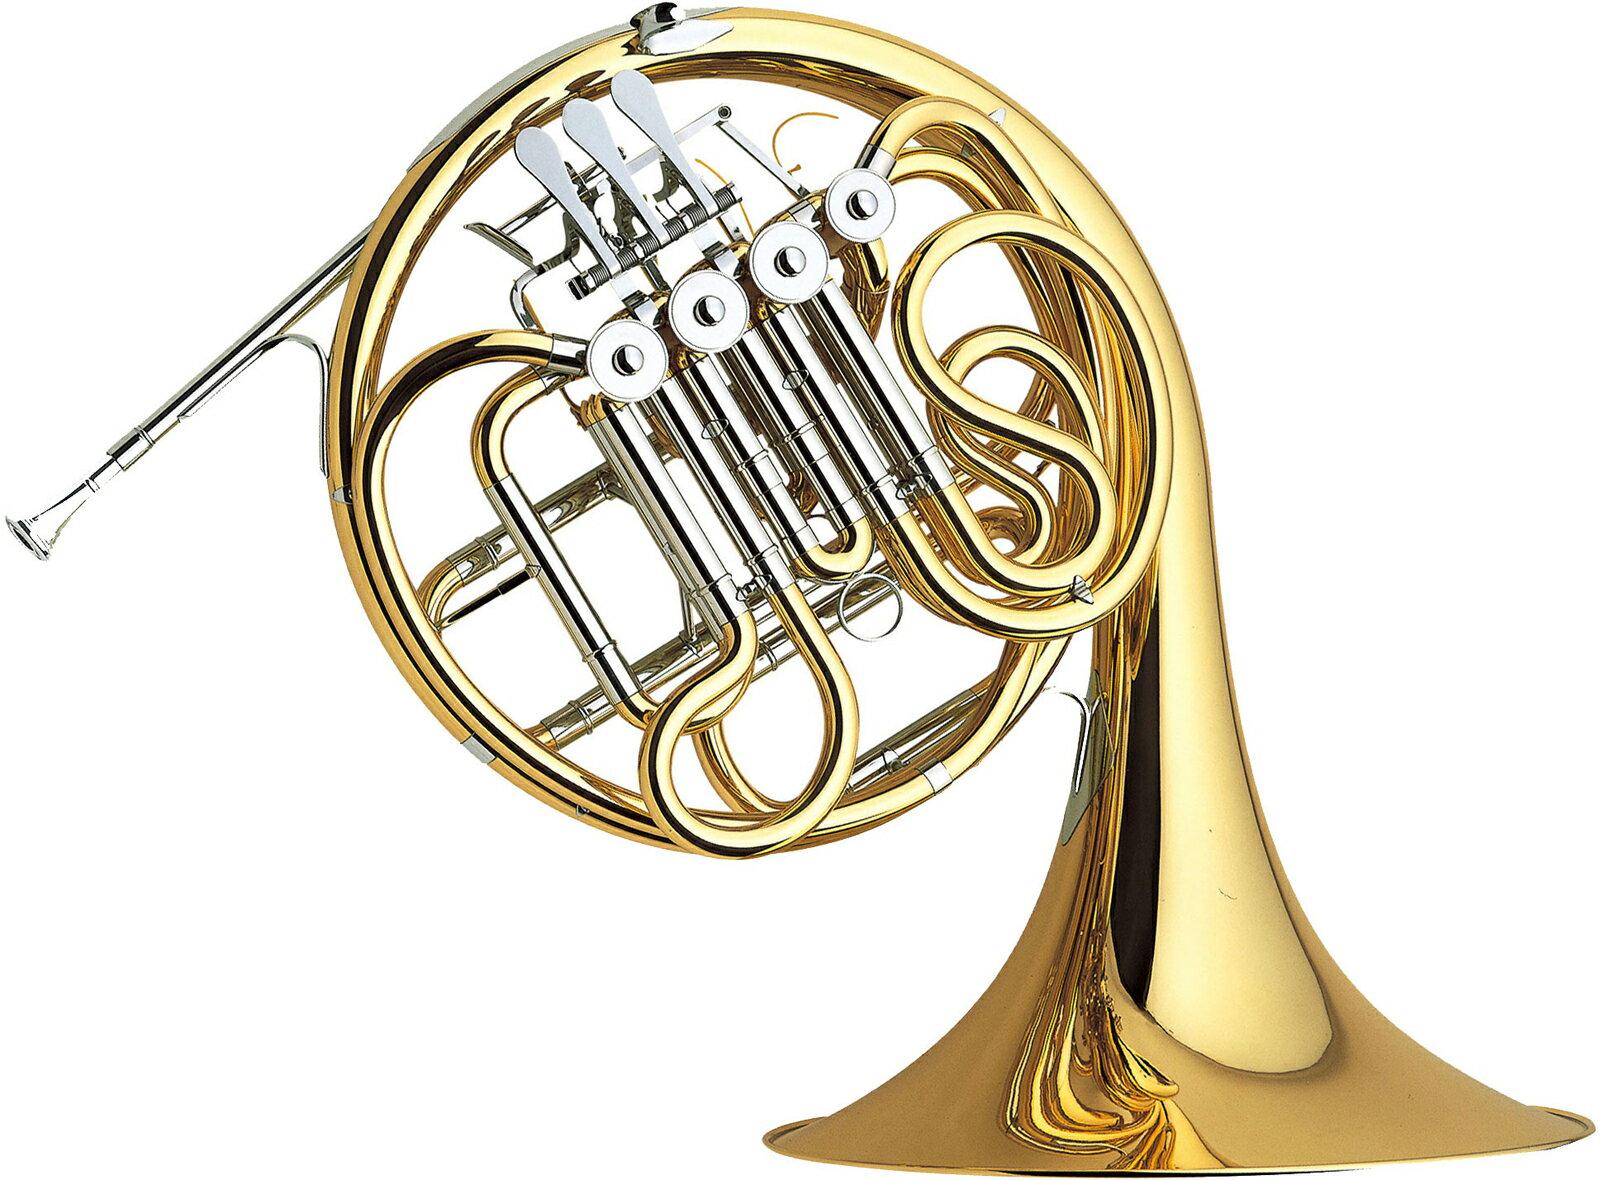 YAMAHA ( ヤマハ ) F/B♭ フルダブルホルン YHR-567 フレンチホルン 新品 4ロータリーバルブ ホルン 一体式 本体 マウスピース HR-32C4 初心者 日本製 管楽器 送料無料